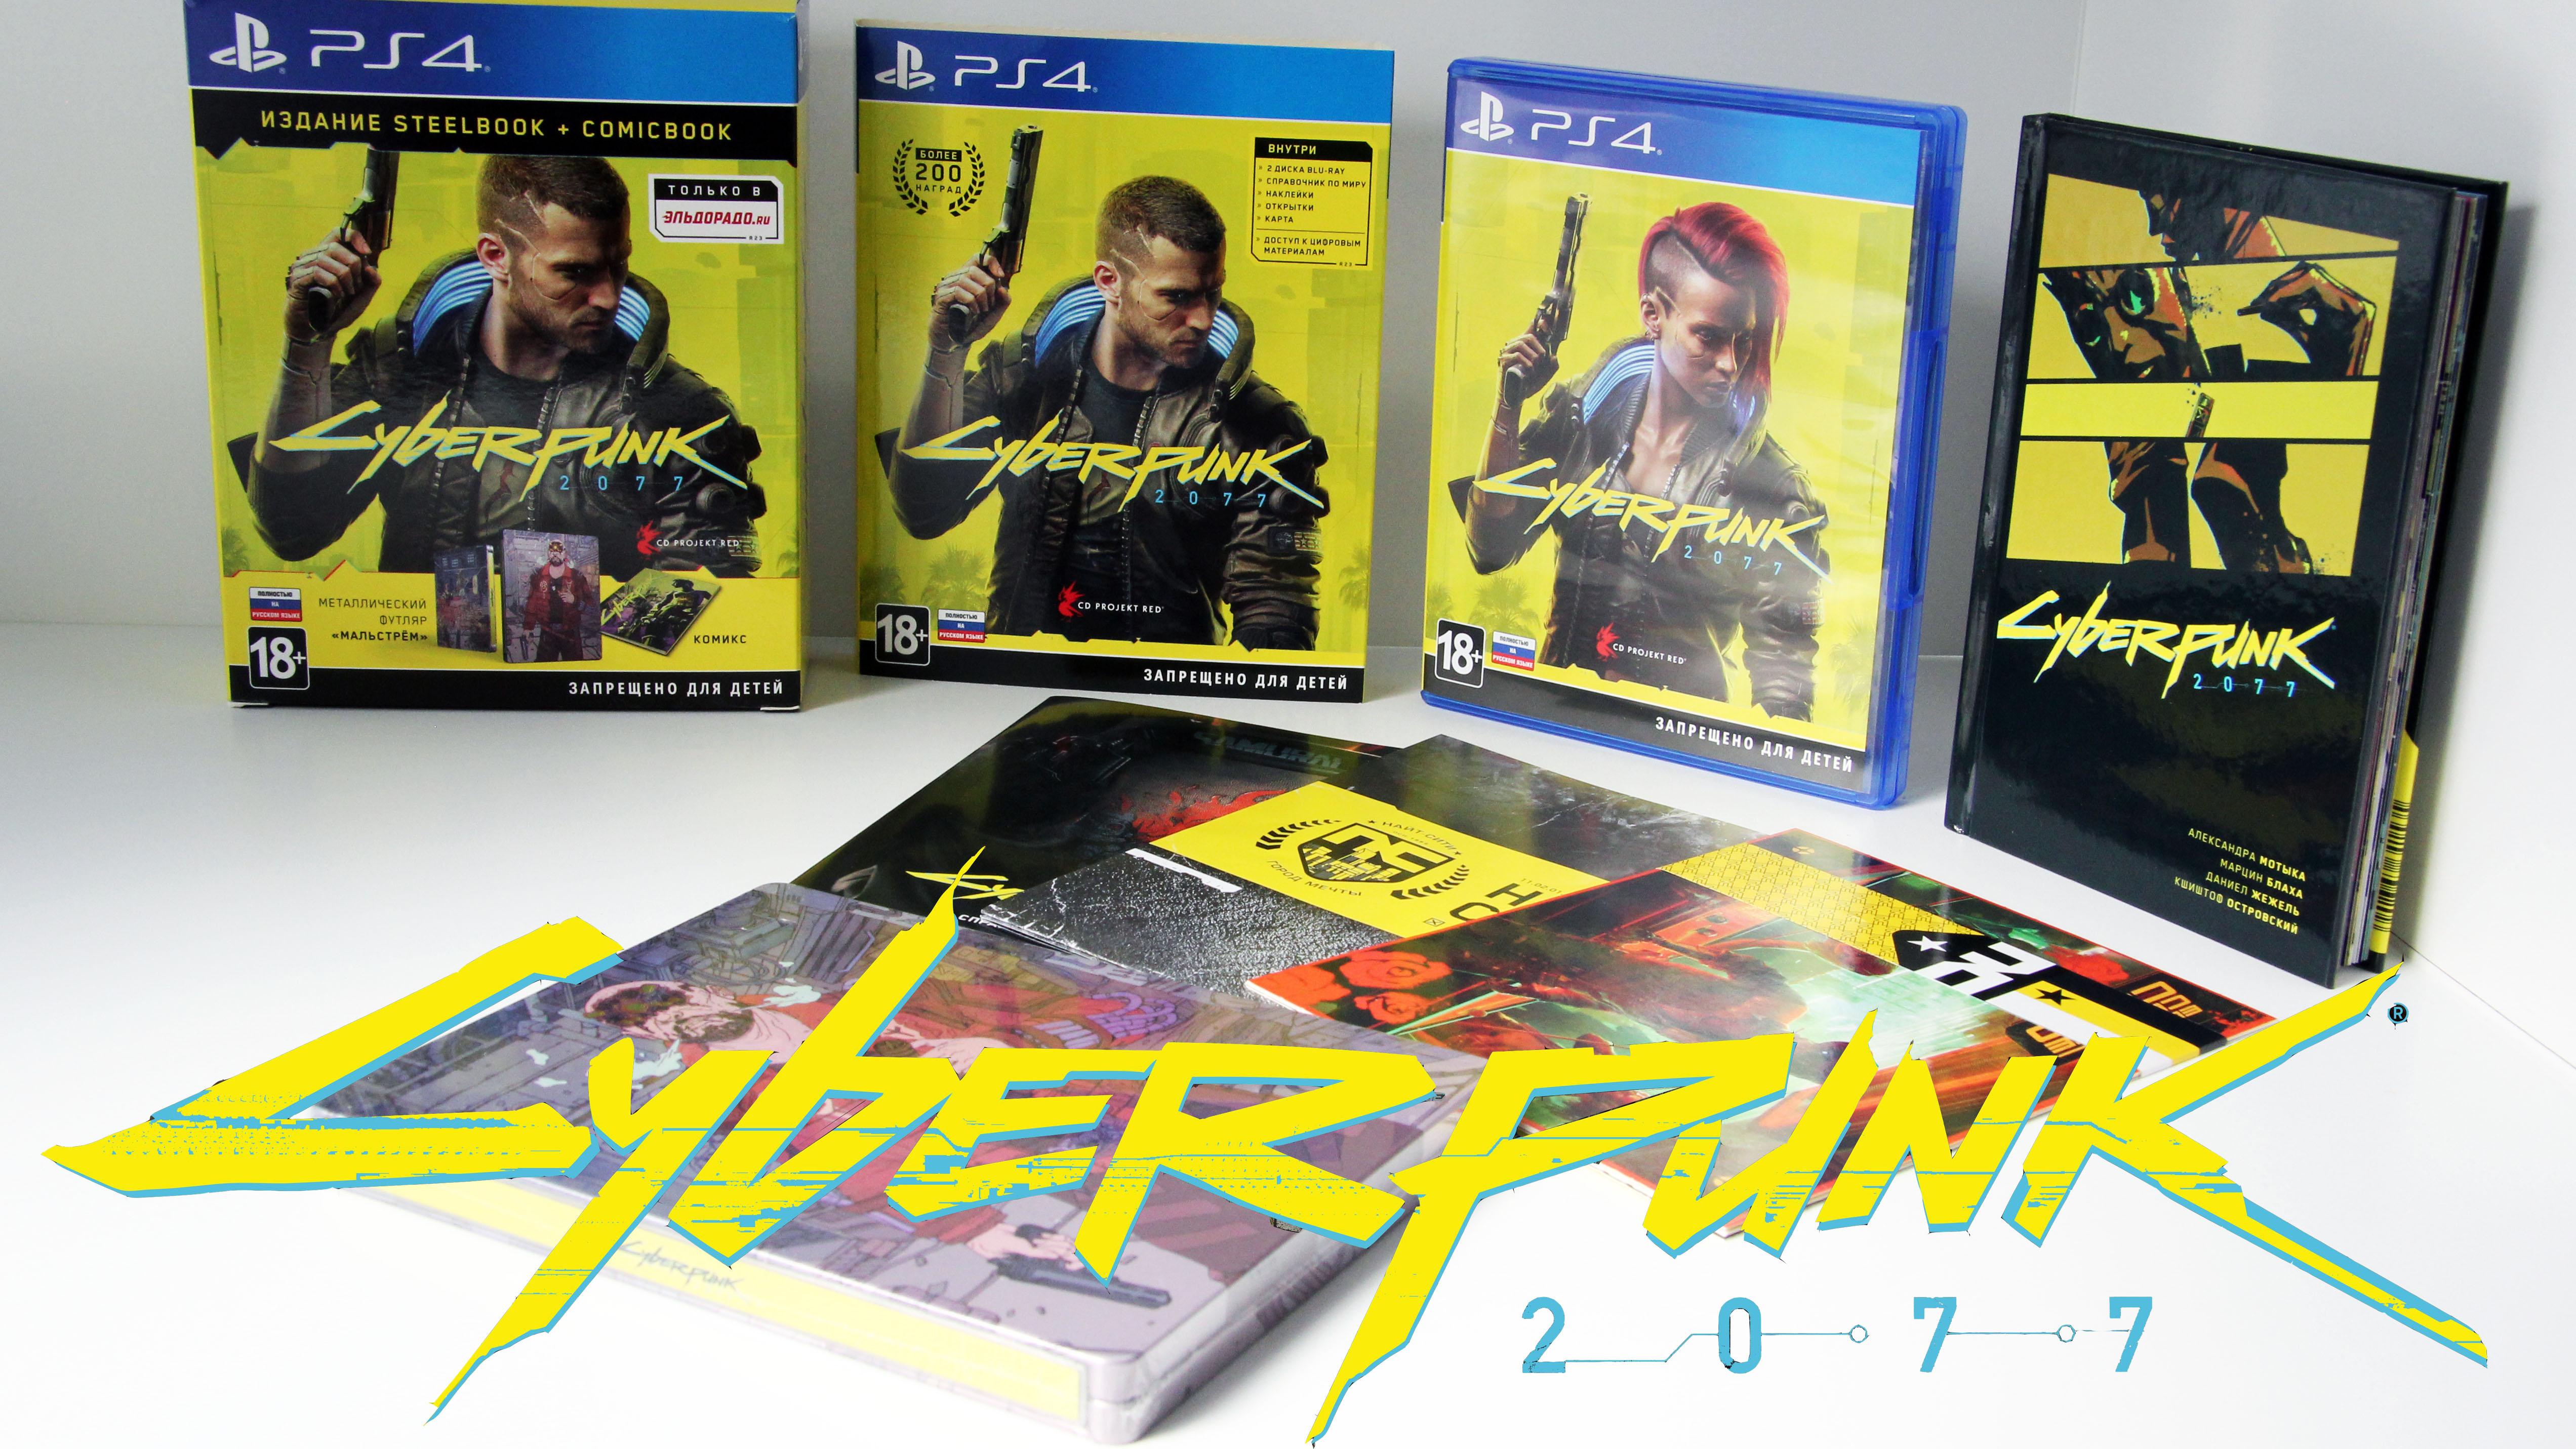 Видеообзор распаковка игры для PS4 CD PROJEKT RED Cyberpunk 2077 Steelbook + Comicbook. Maelstrom